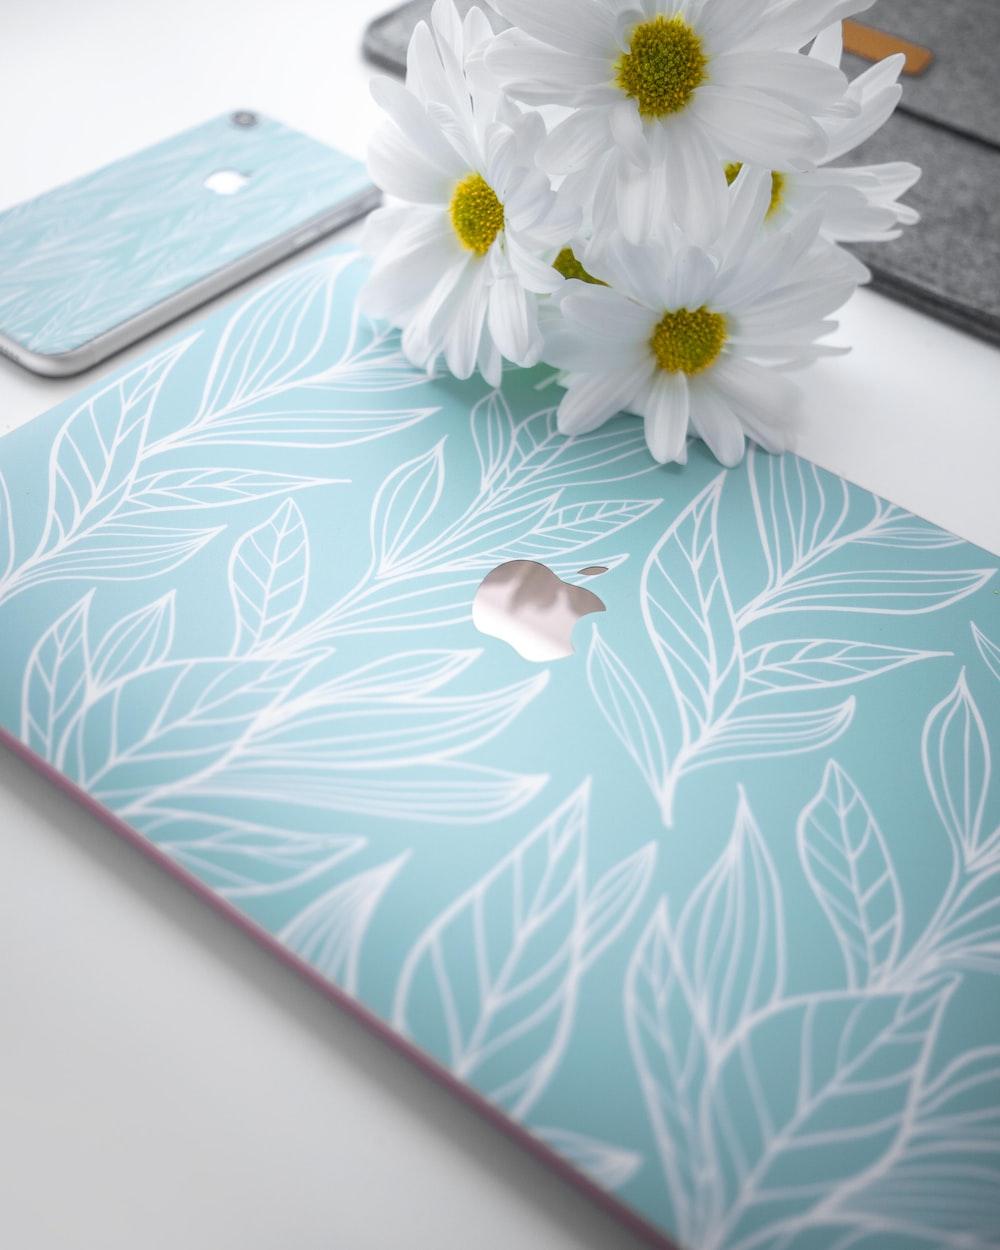 white daisies besides Apple laptop